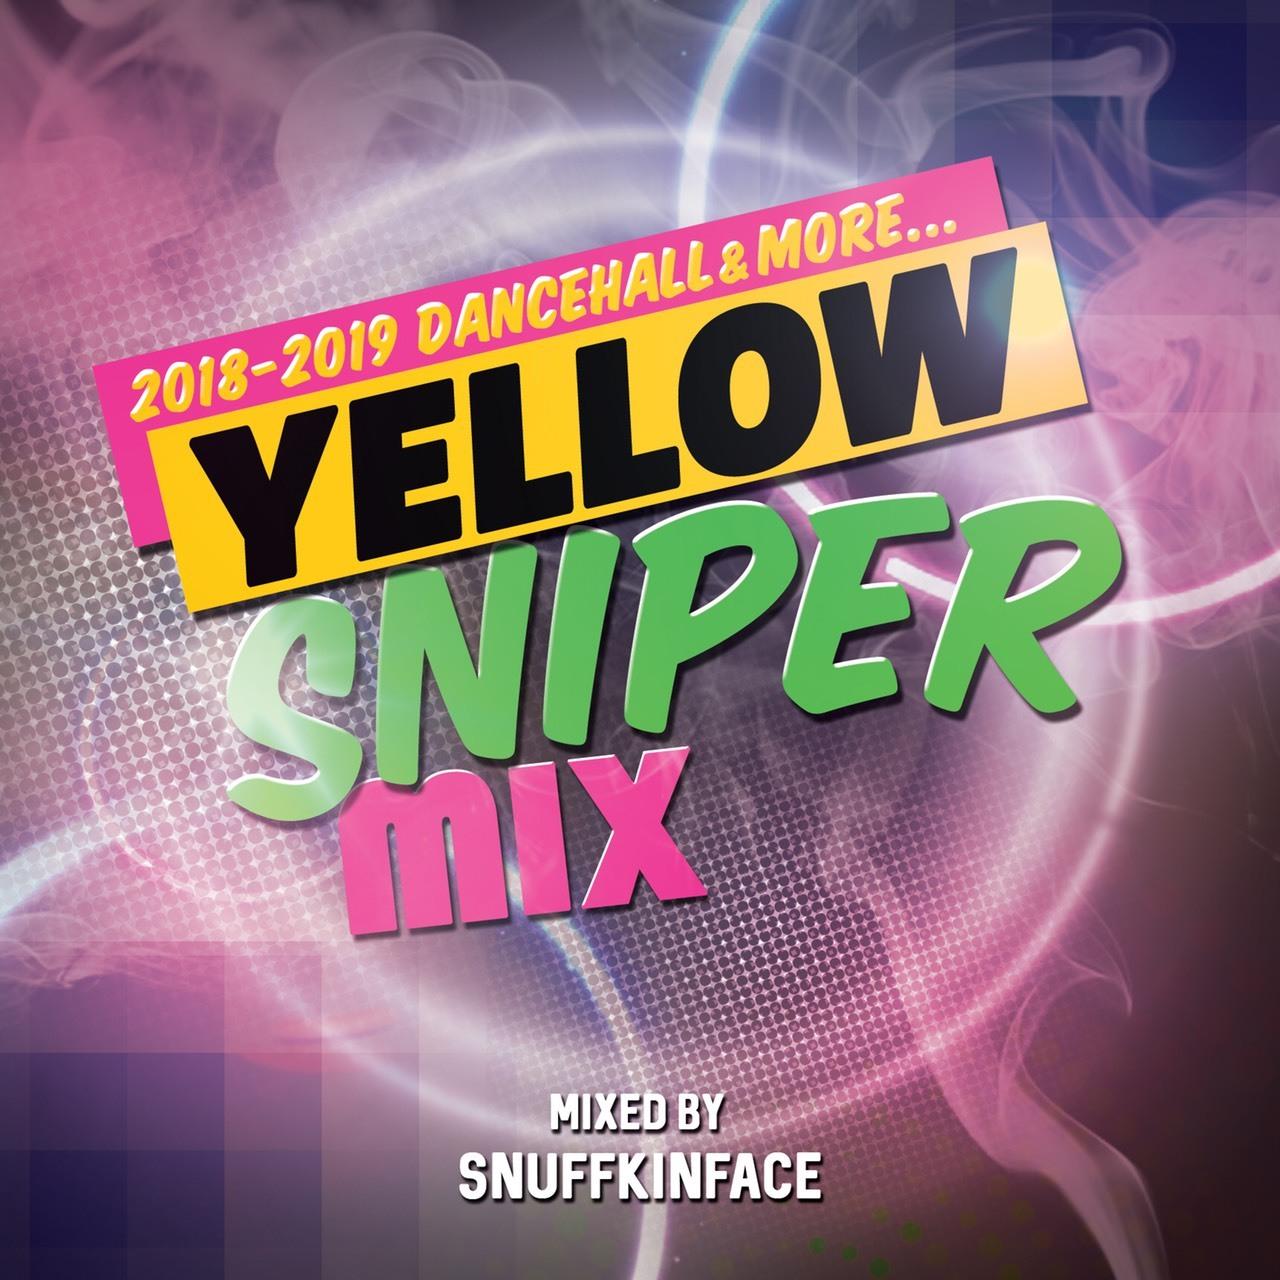 [MIX CD] SNUFFKINFACE / YELLOW SNIPER MIX